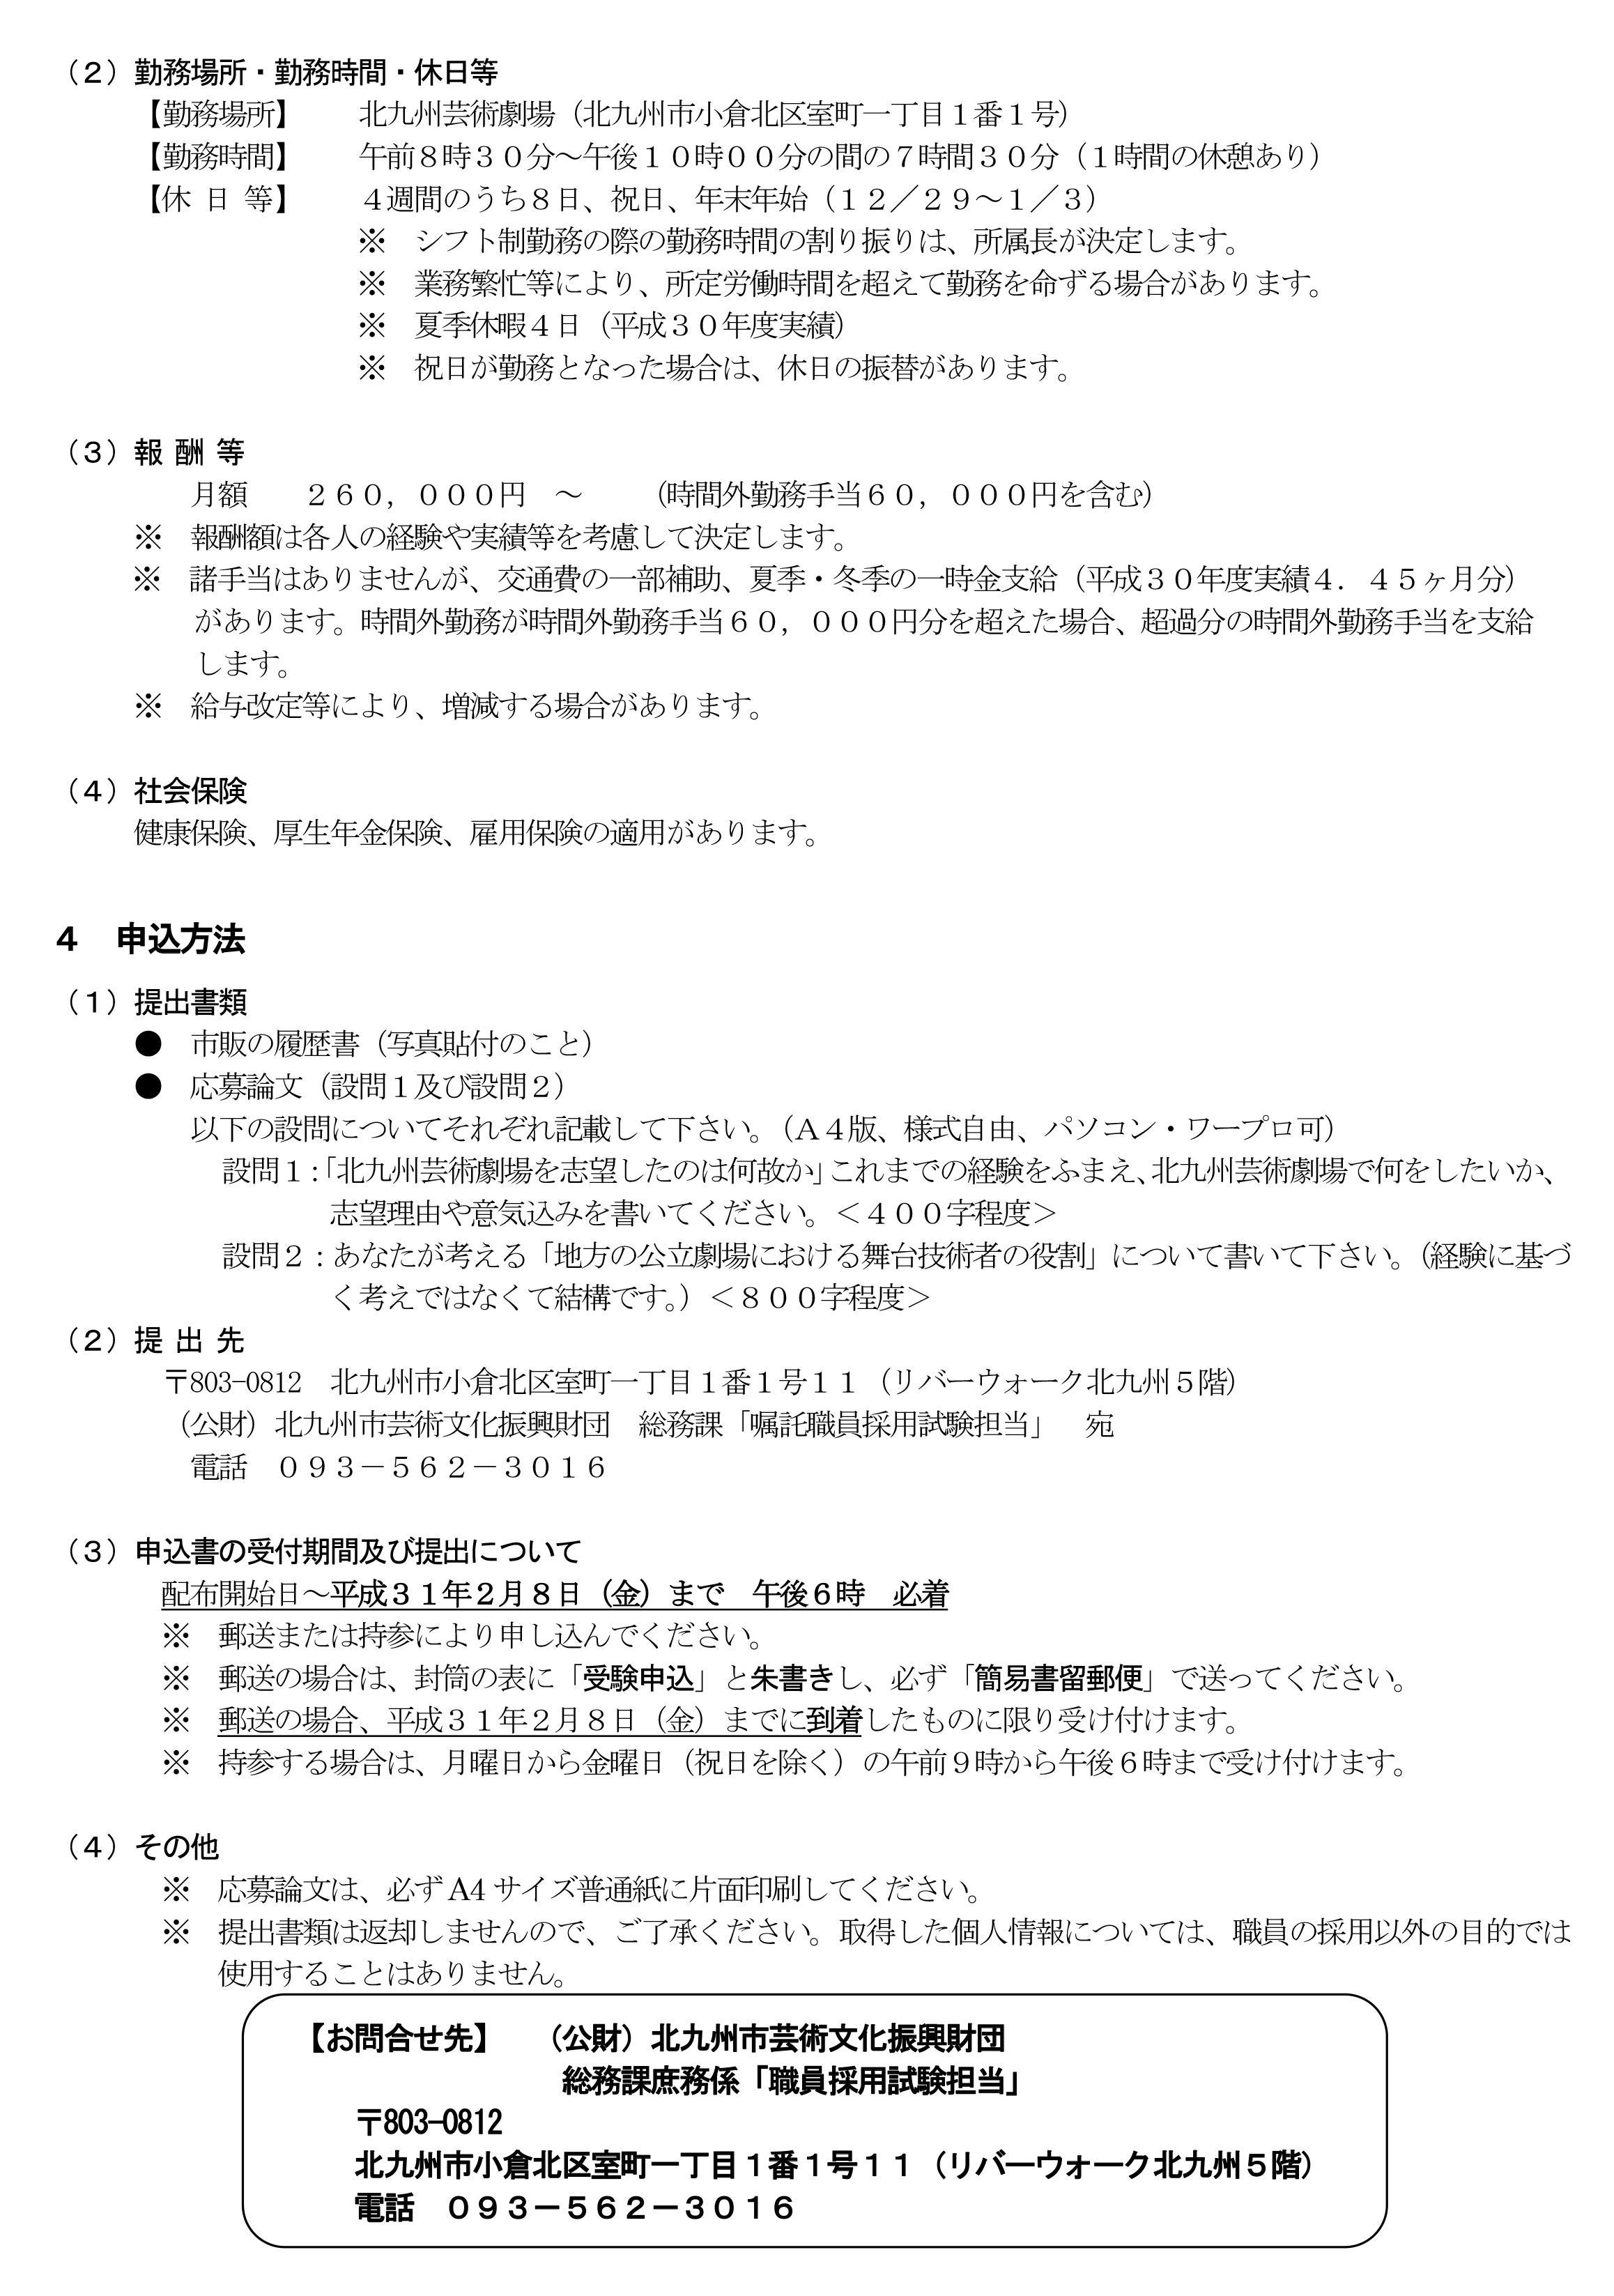 h31_kikou_youkou2.jpg